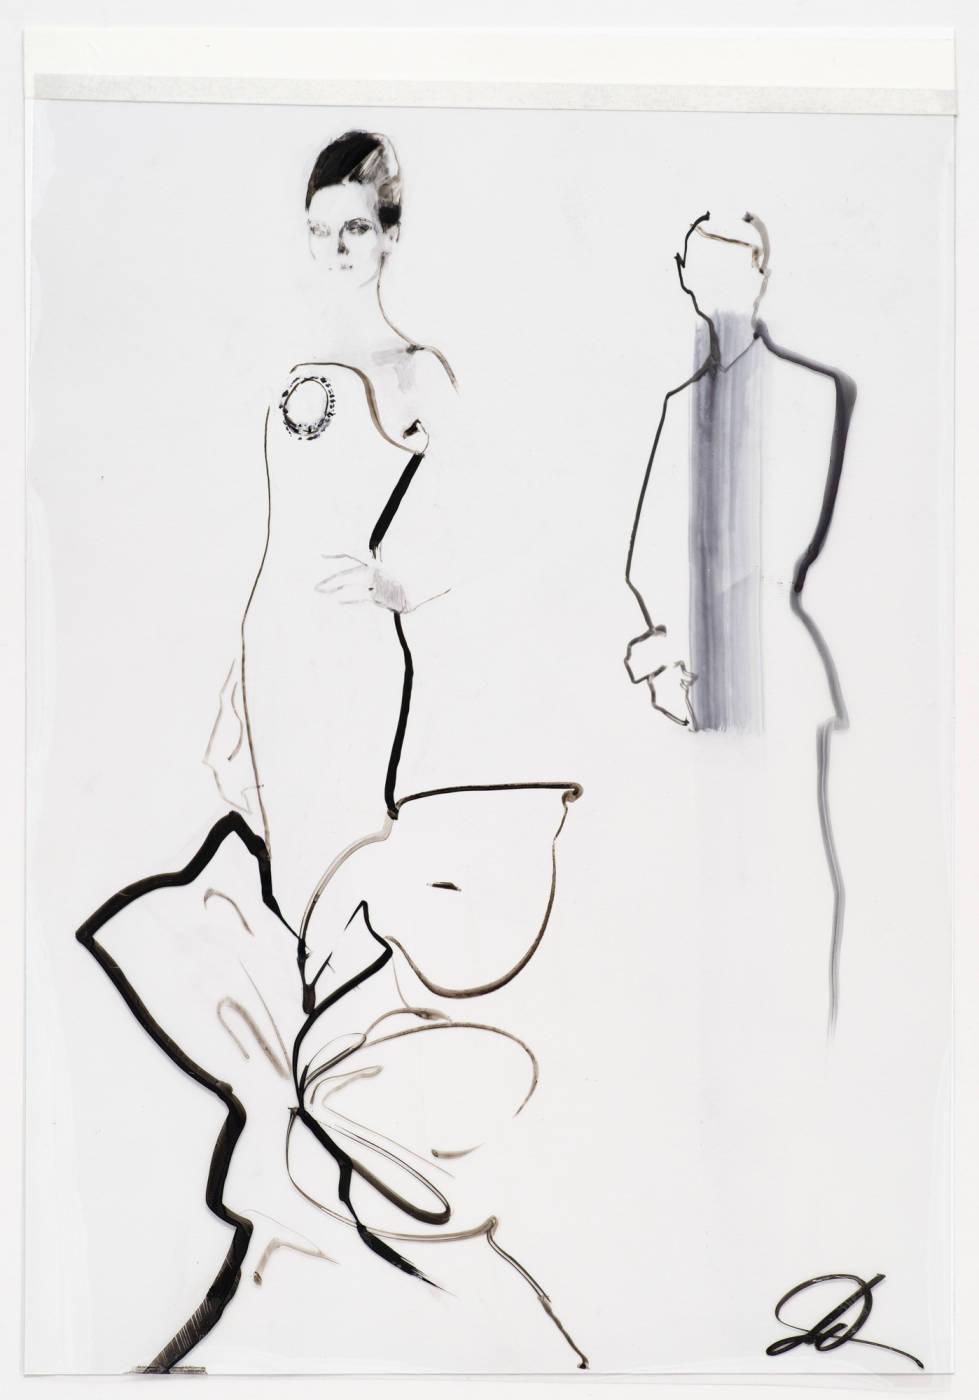 Stephane Rolland Paris Couture Spring/Summer 2020